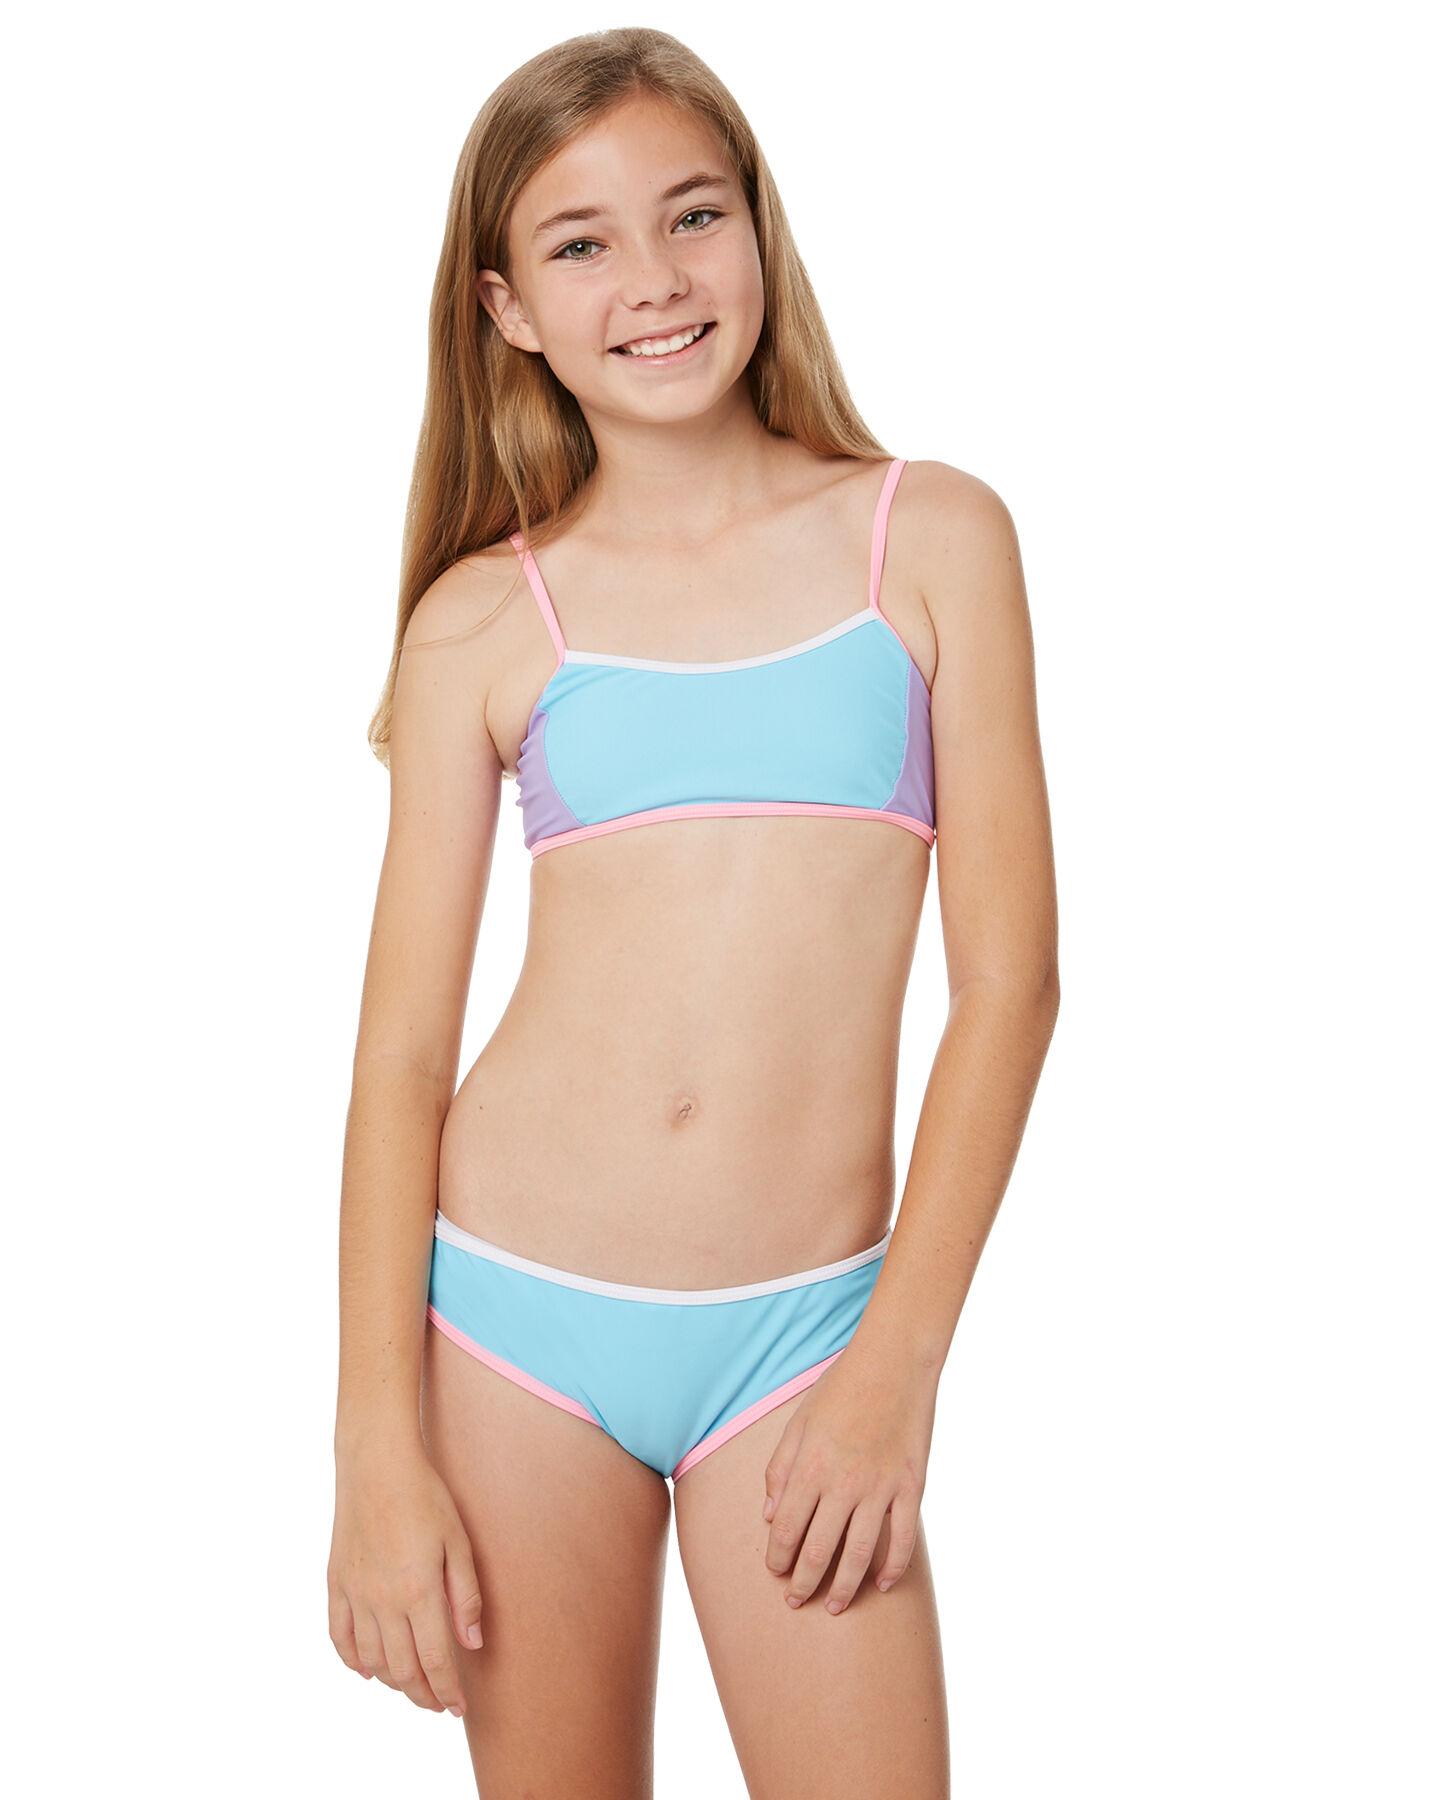 Bikini girl underwear, sexy babe tv com